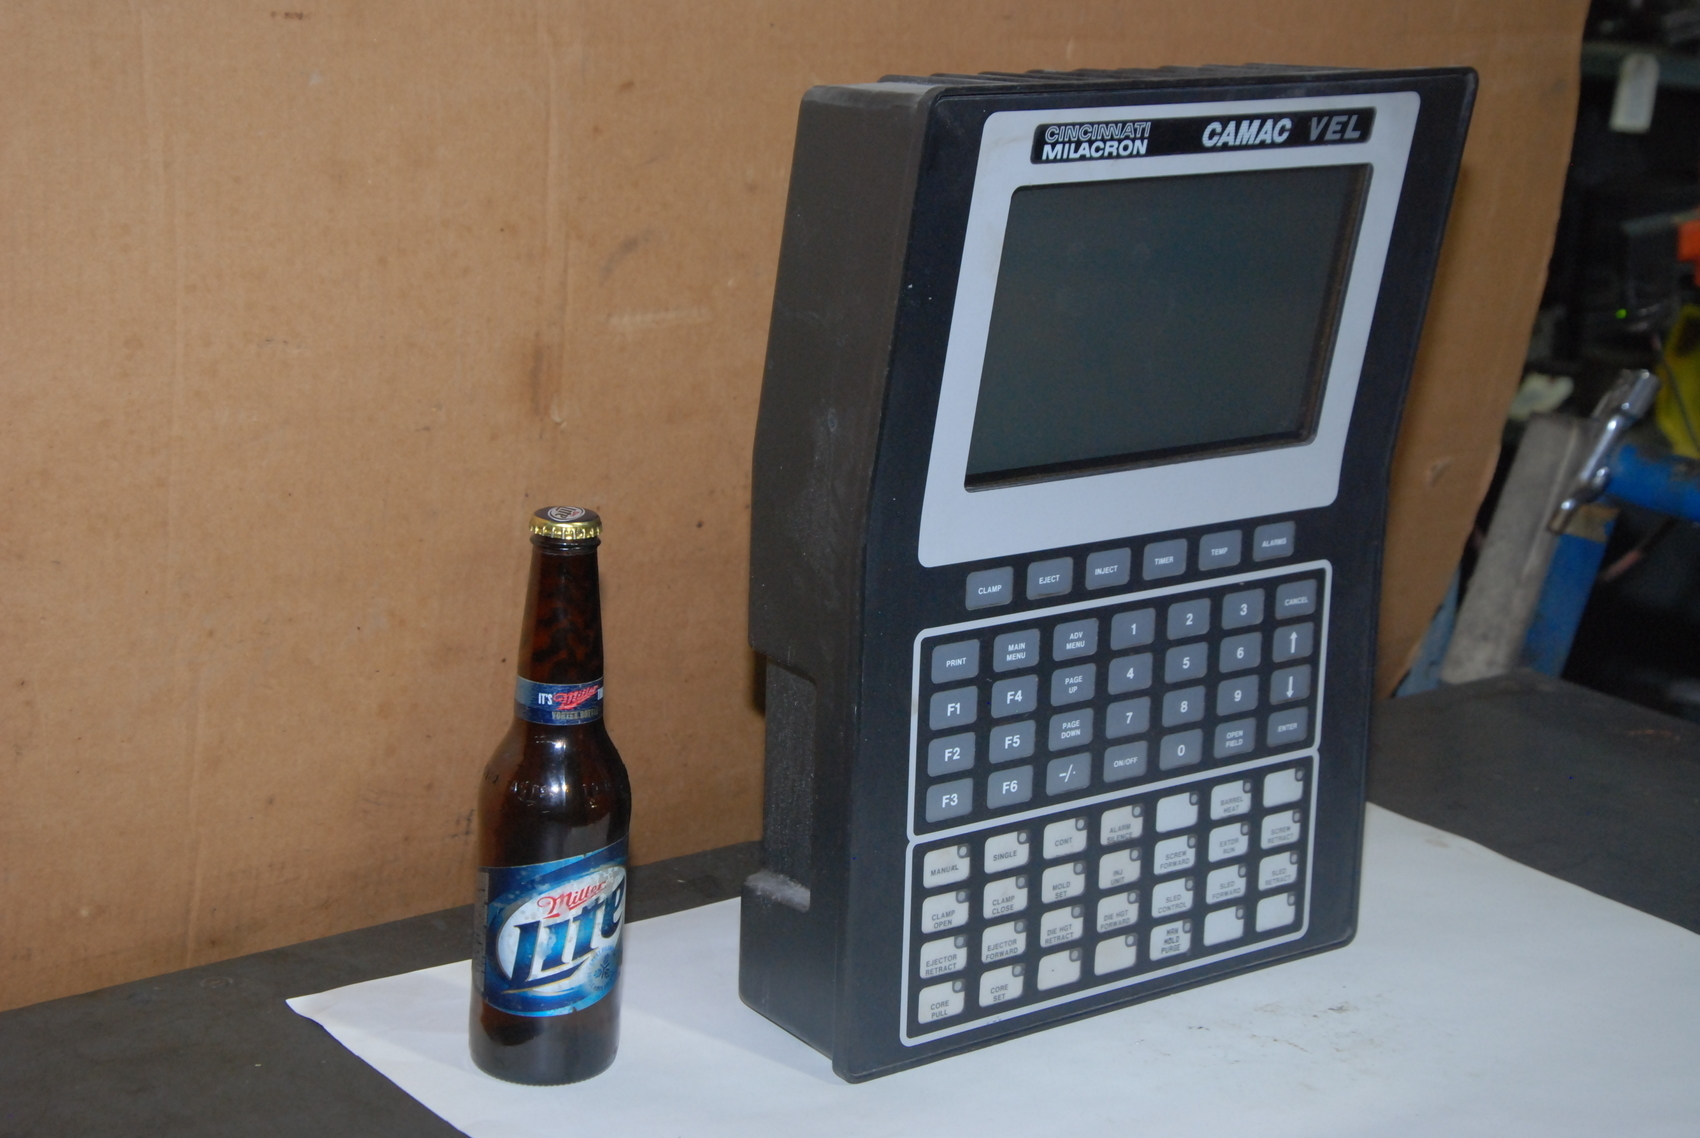 camac Vel monitor Cincinnati milacron injection molder vh 250-21